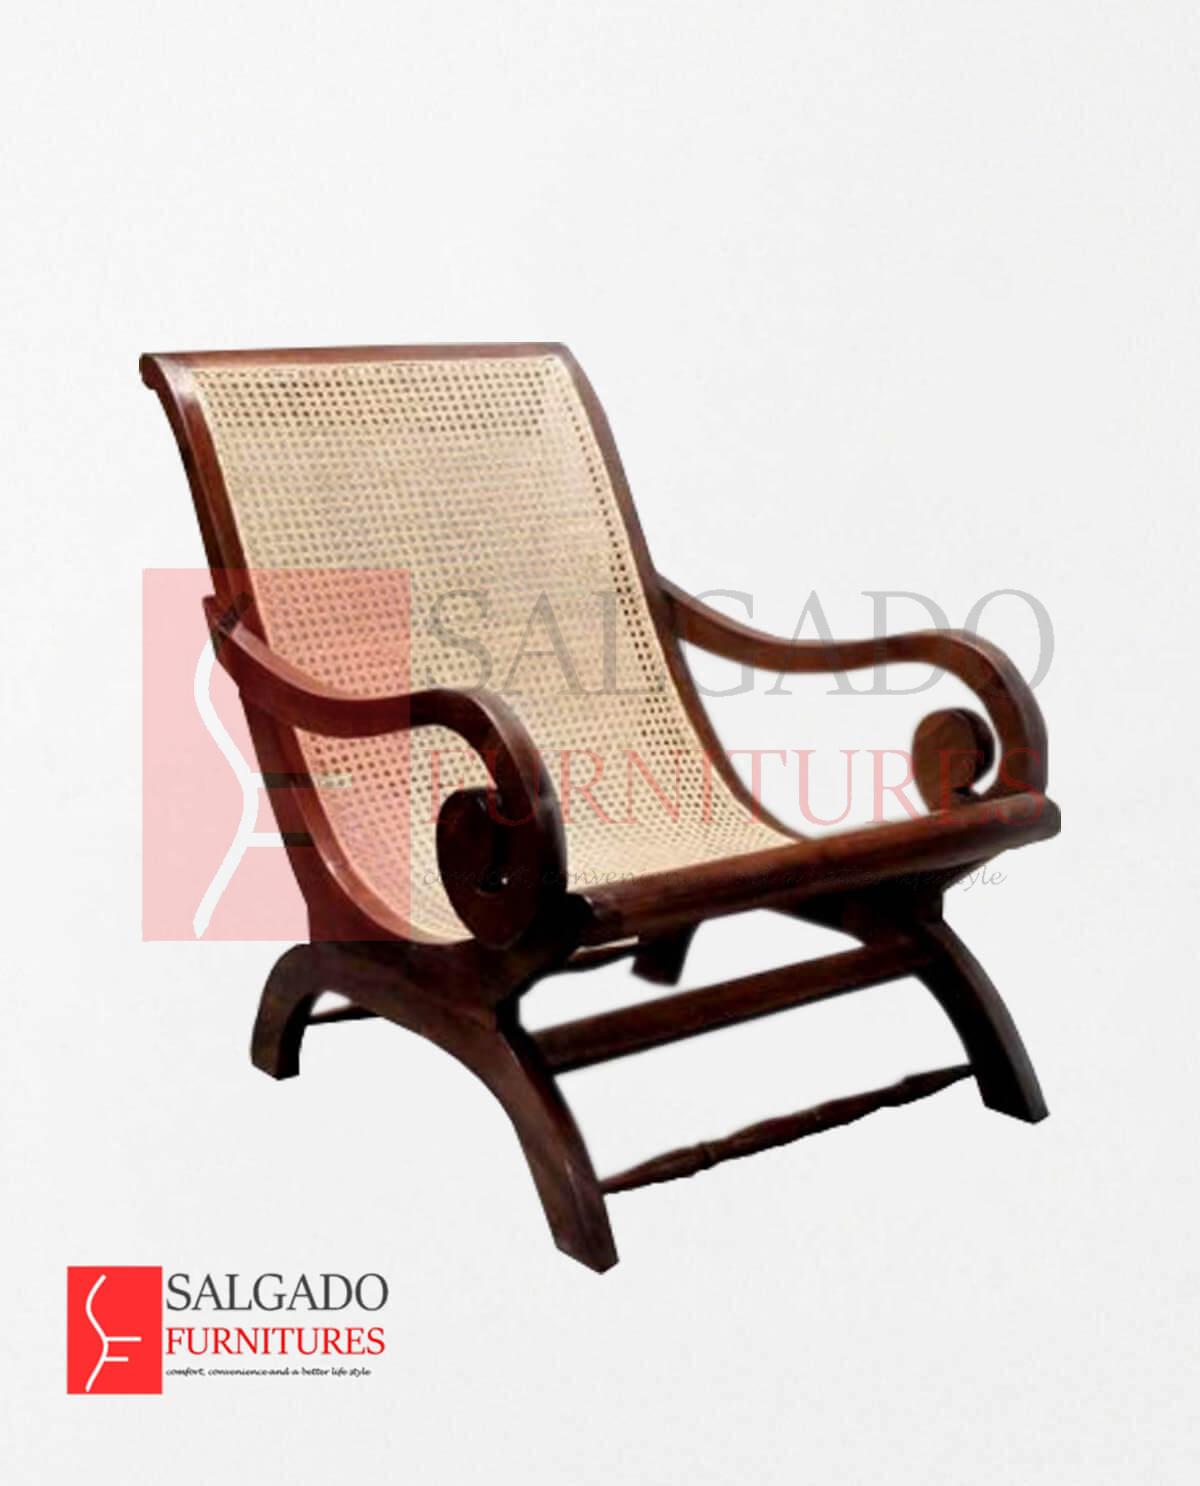 outdoor-varandha-chair